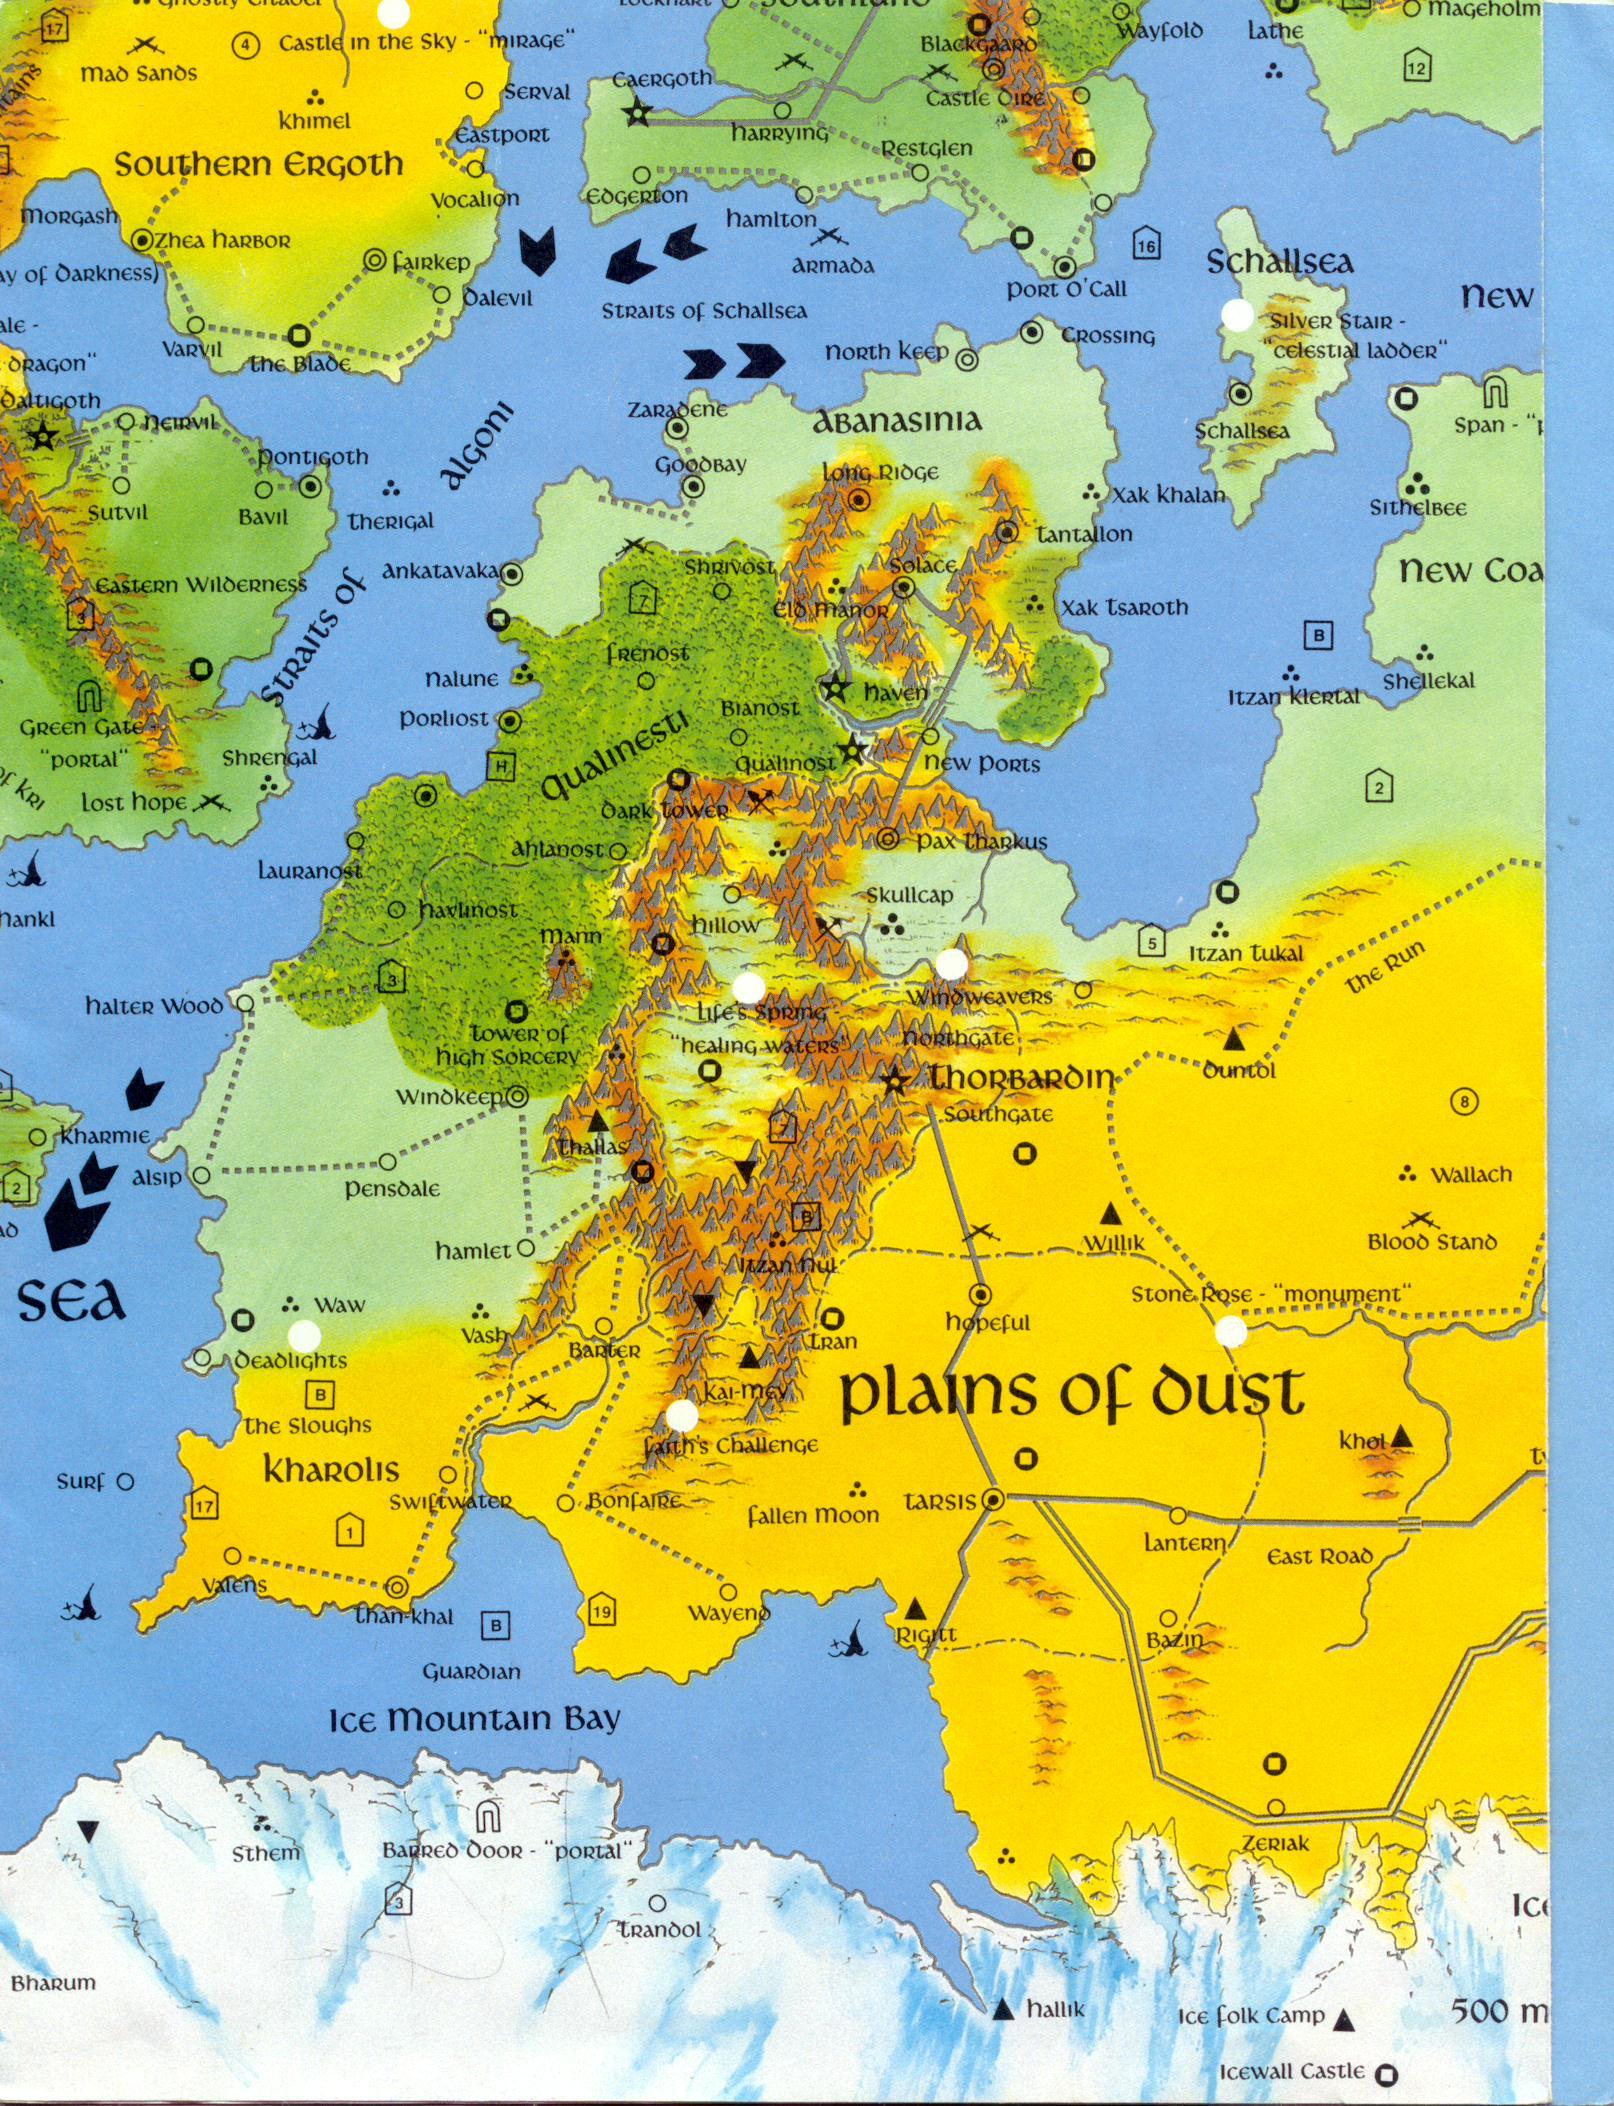 http://griselric.free.fr/Cartographe/Dragonlance/dl_map2.jpg